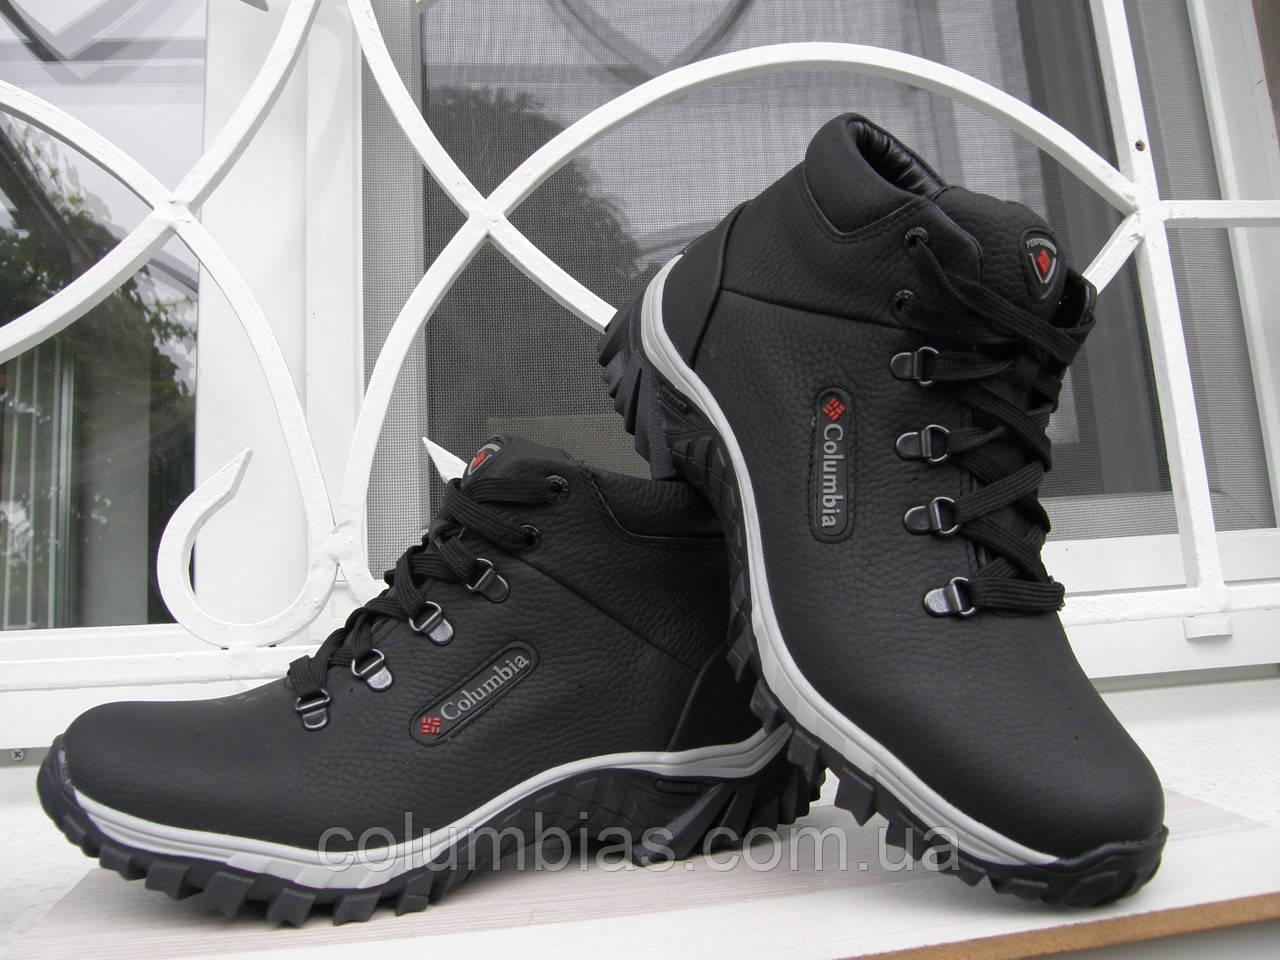 Зимние ботинки Collumbia кожа